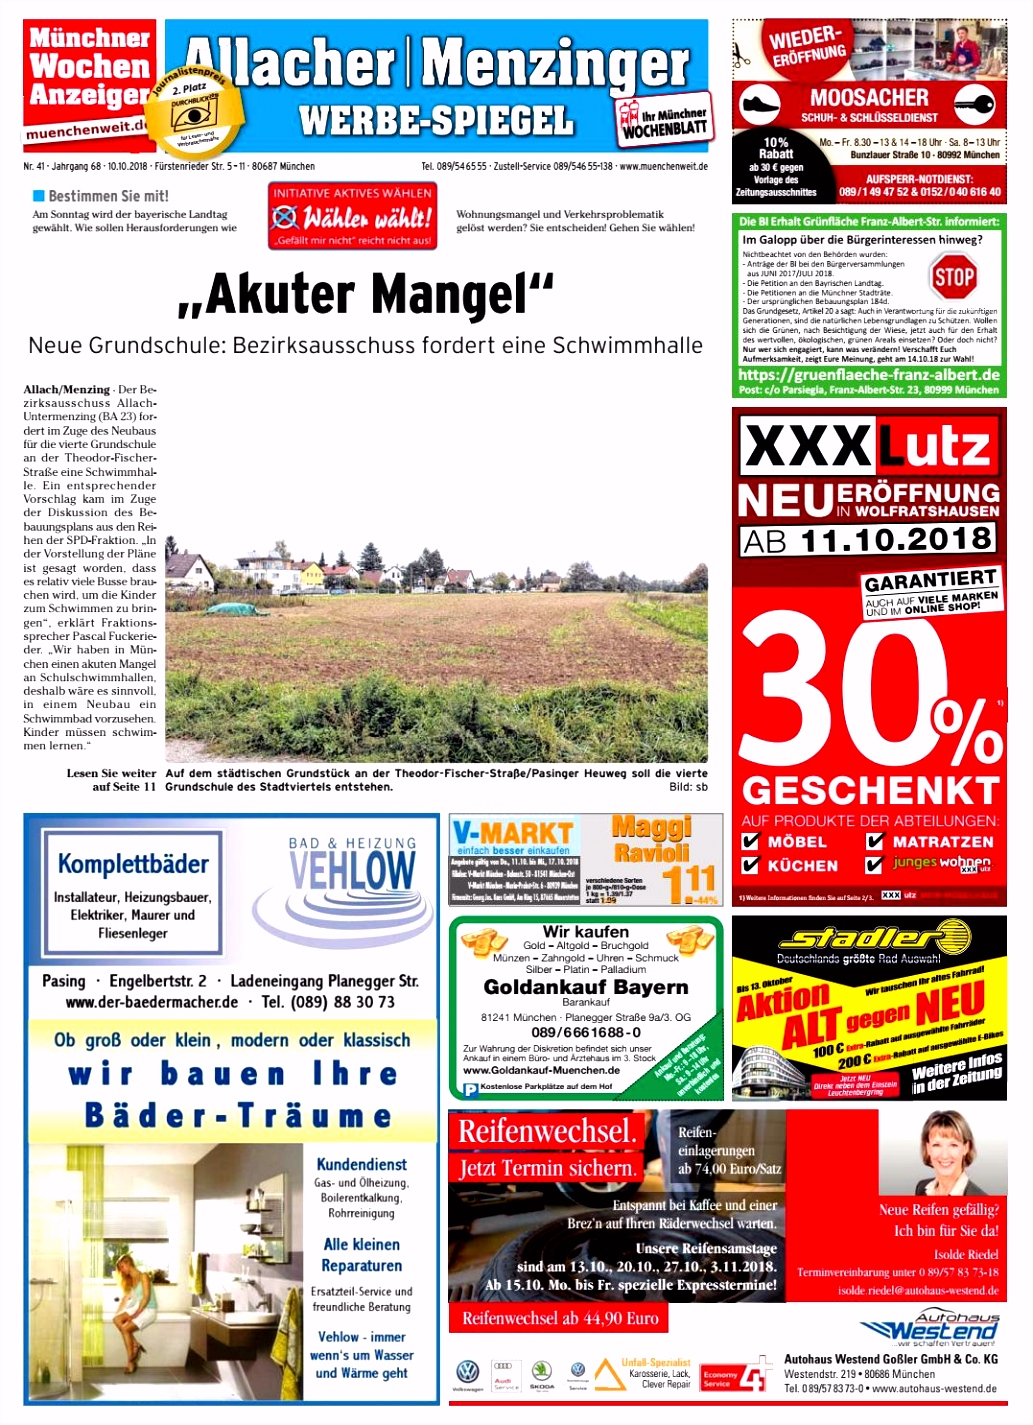 KW 41 2018 by Wochenanzeiger Me n GmbH issuu